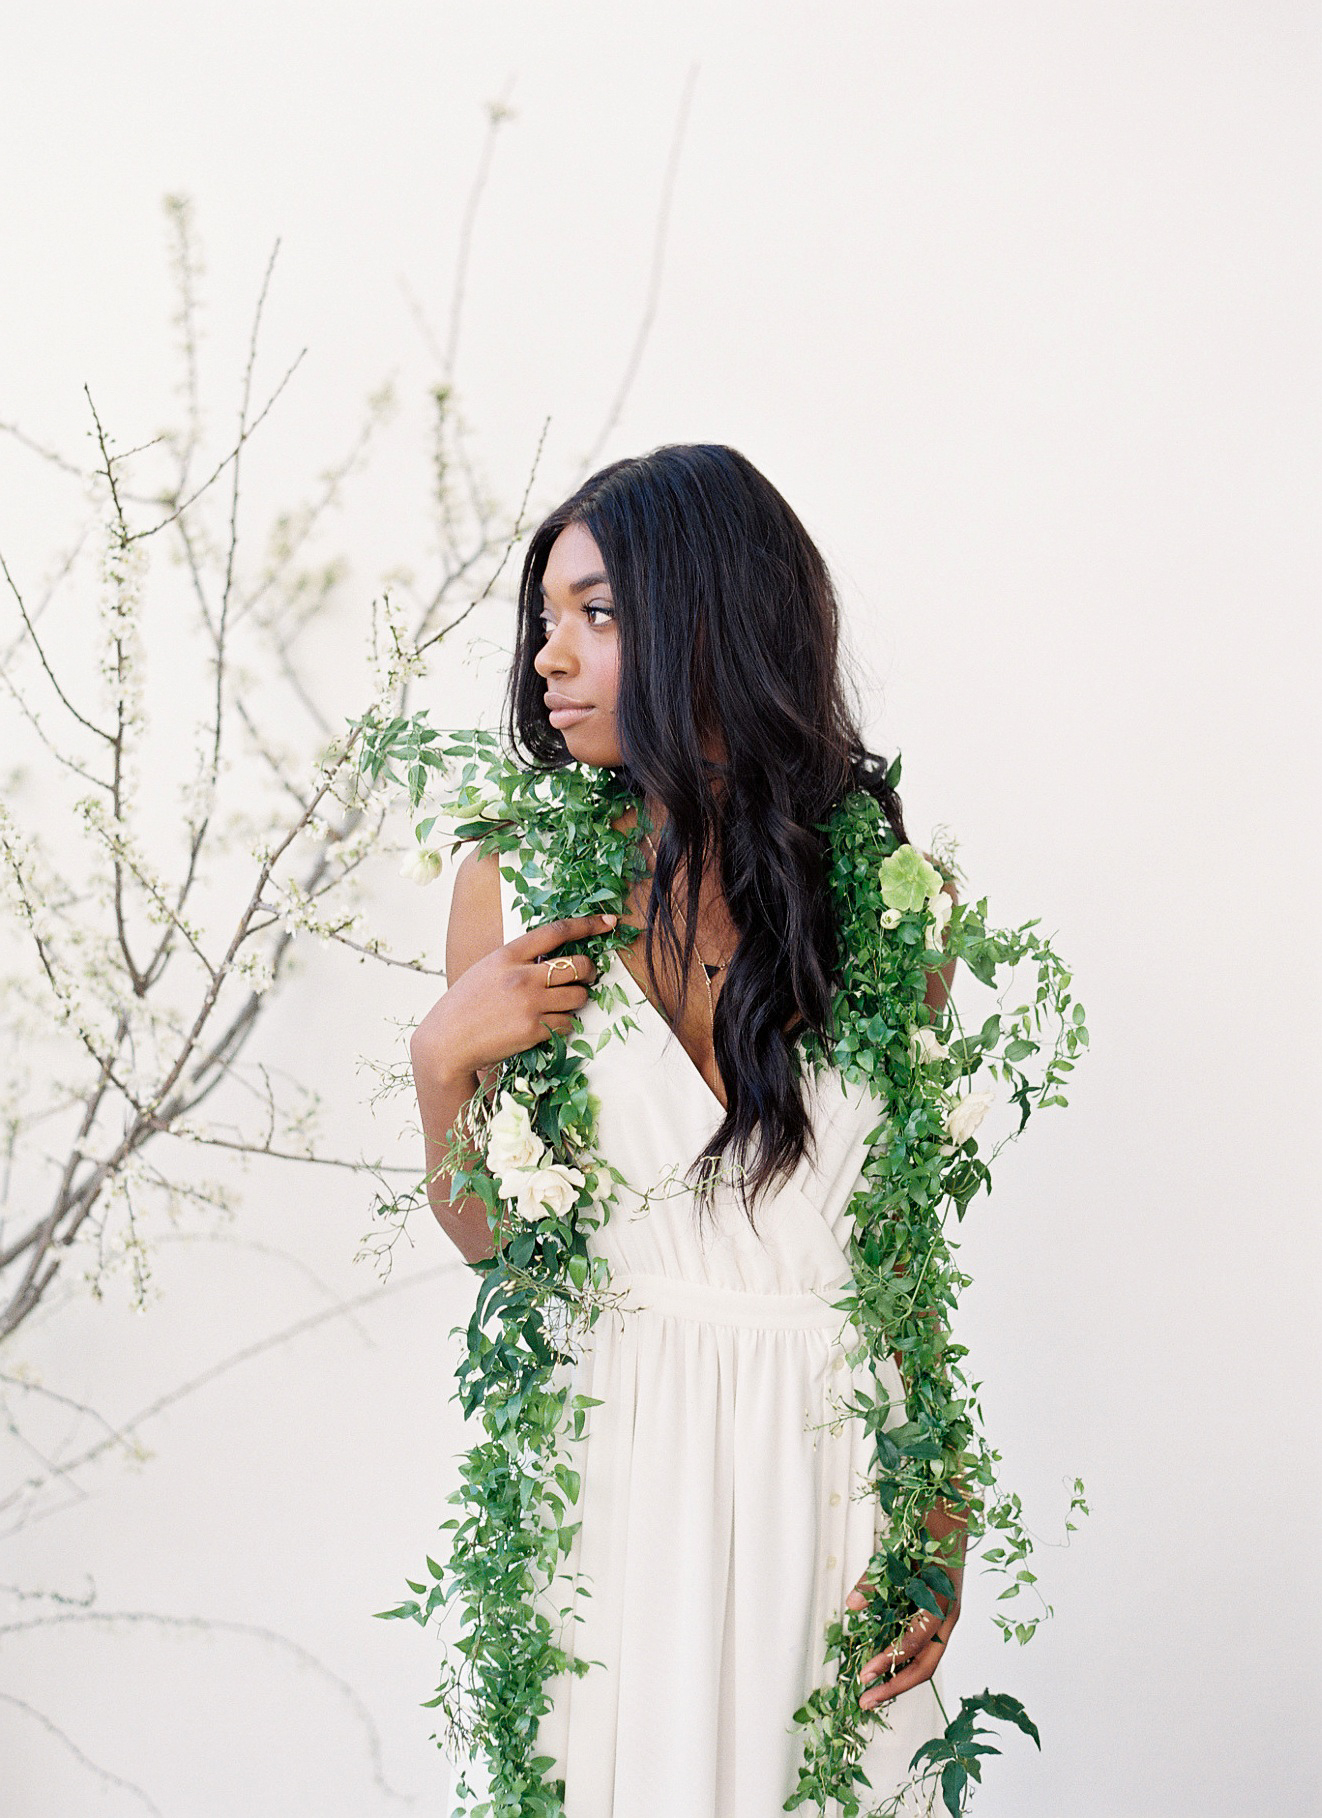 Floralessence-Esmeraldafranco-10.JPG